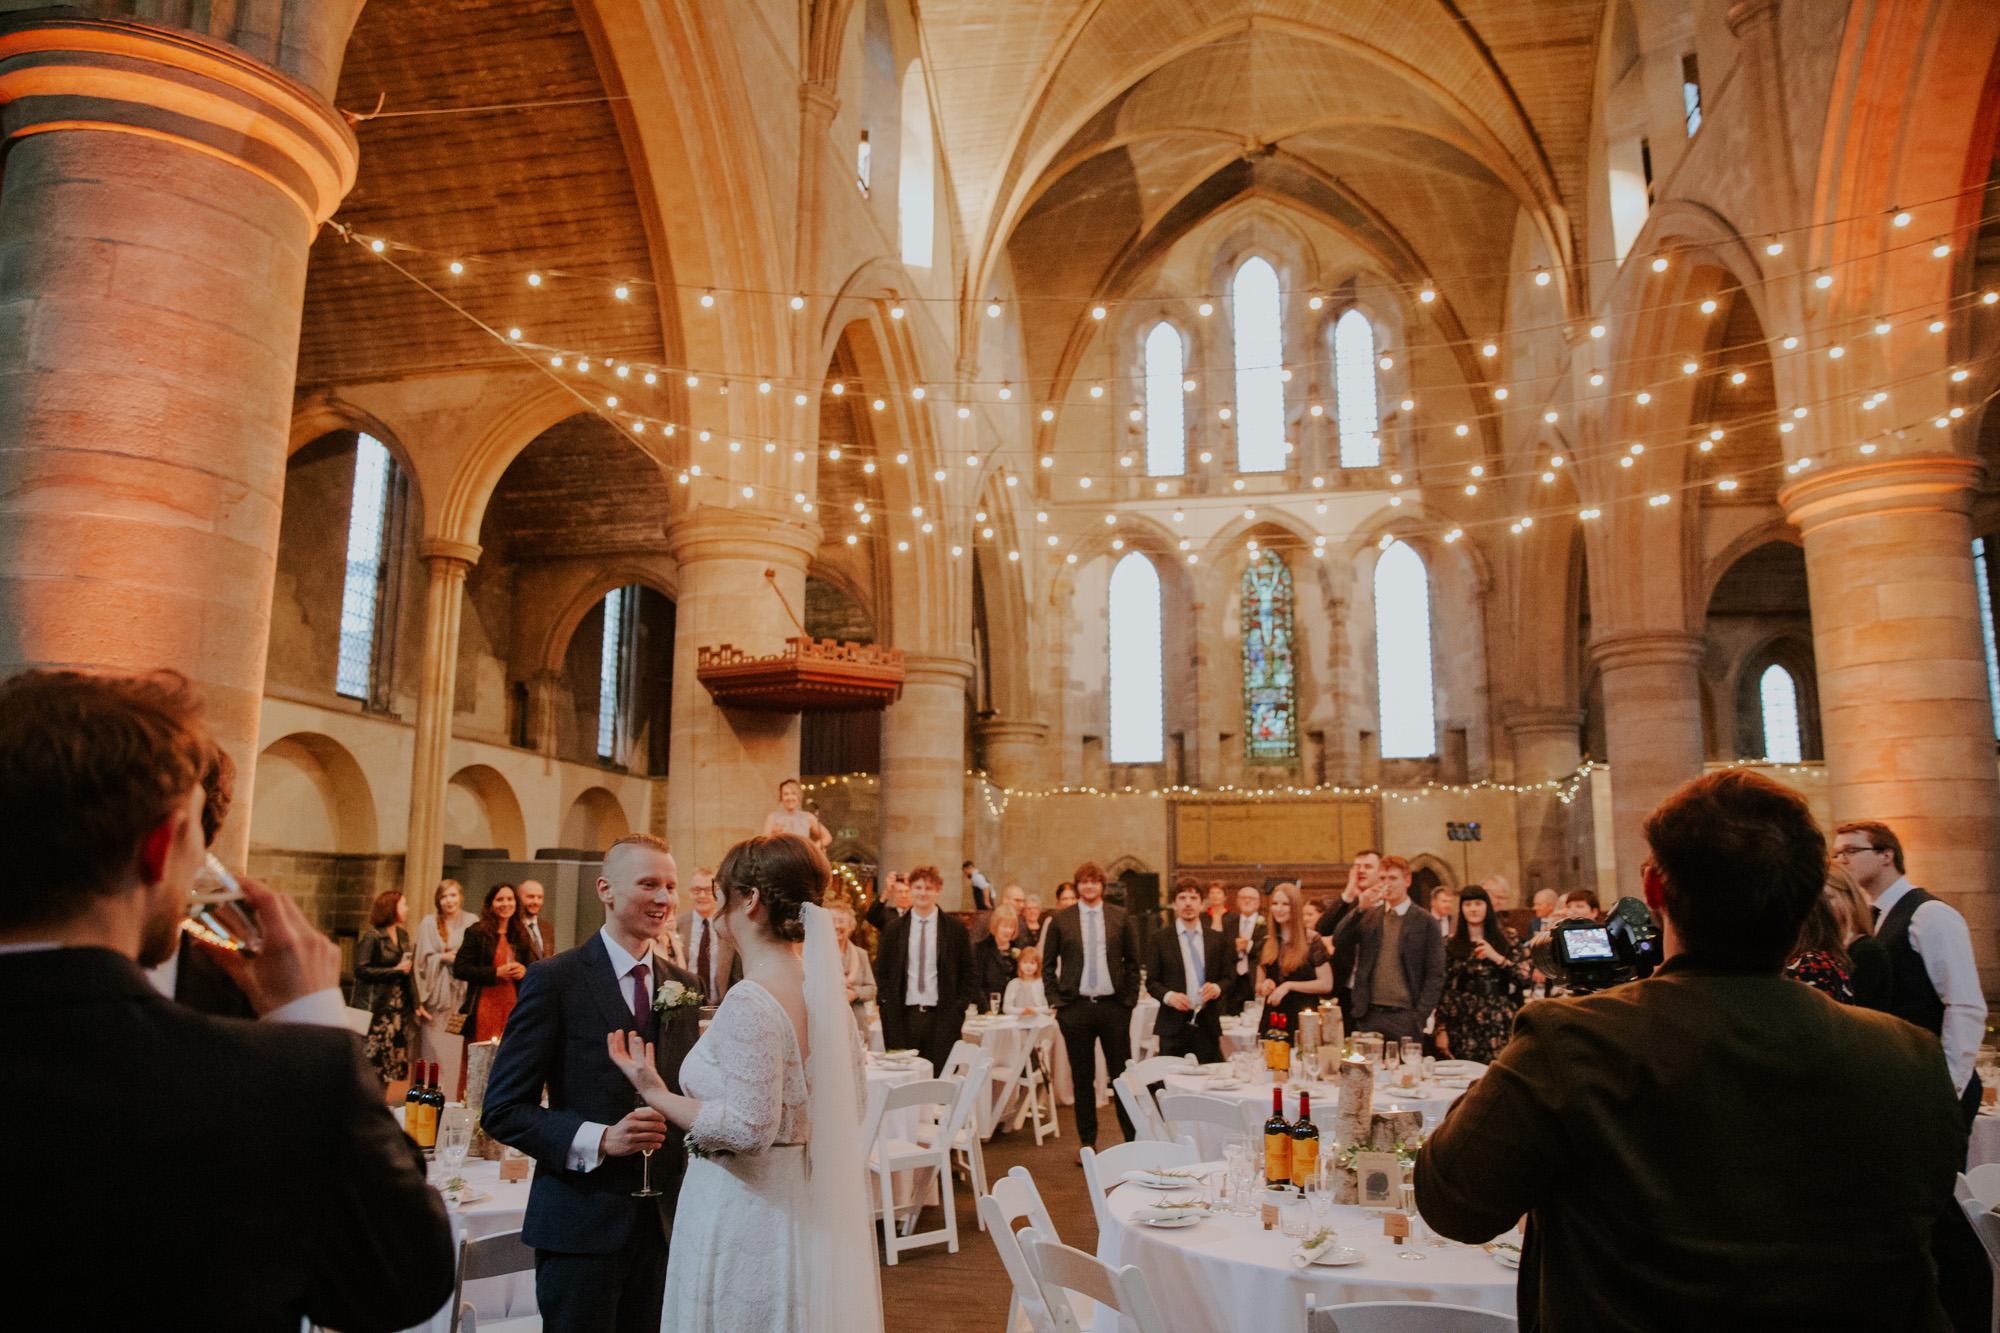 Kate-Beaumont-Bespoke-Bridal-Dahlia-Lace-Wedding-Gown-Cool-Leeds-Wedding-36.jpg